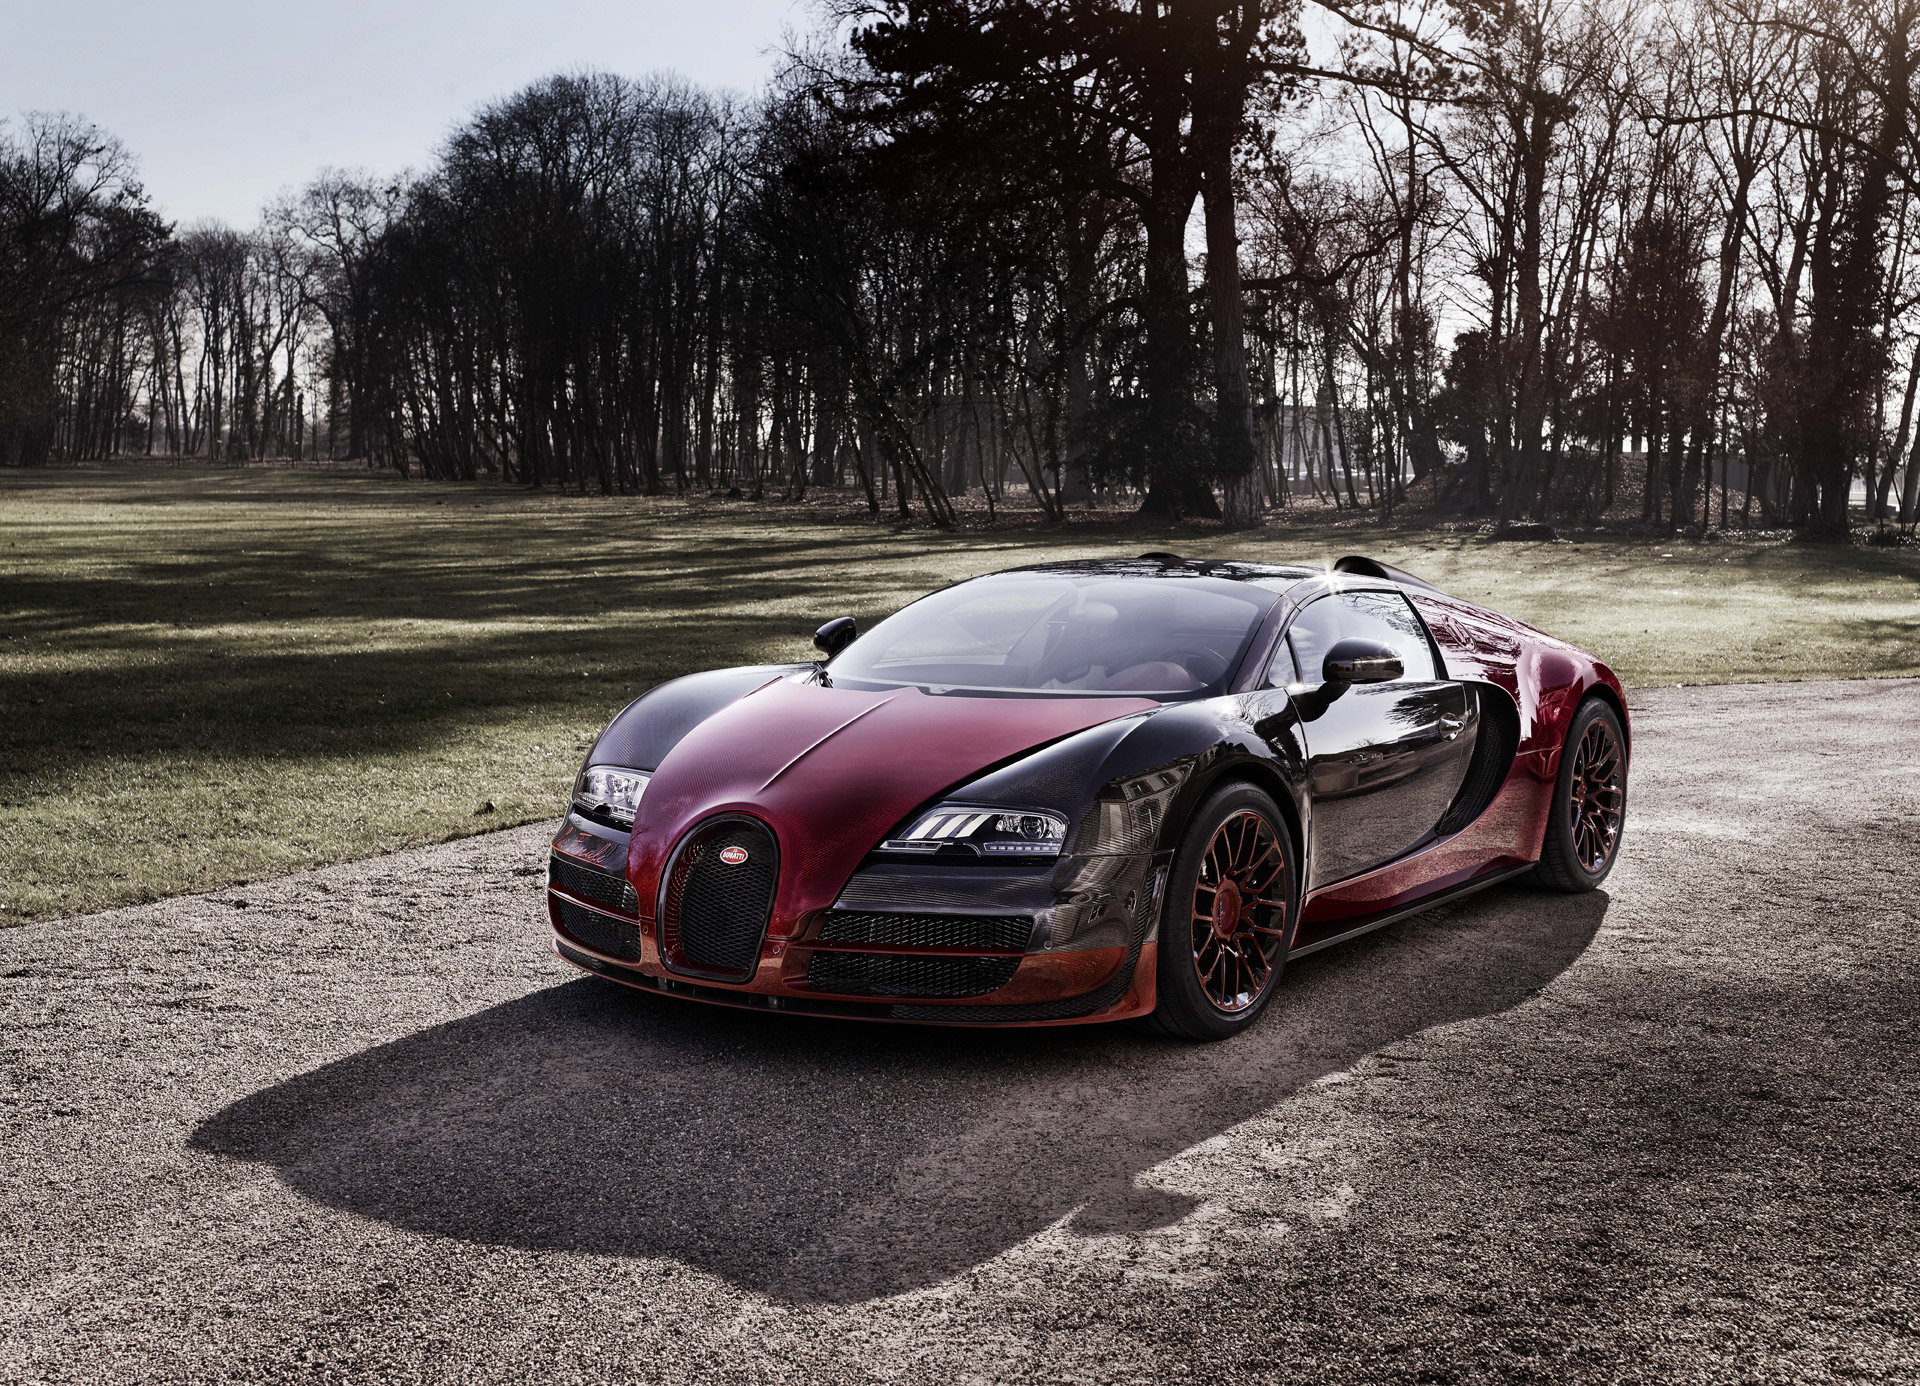 bugatti-veyron-grand-sport-vitesse-la-finale_100502456_h Inspiring Bugatti Veyron Quarter Mile Speed Cars Trend